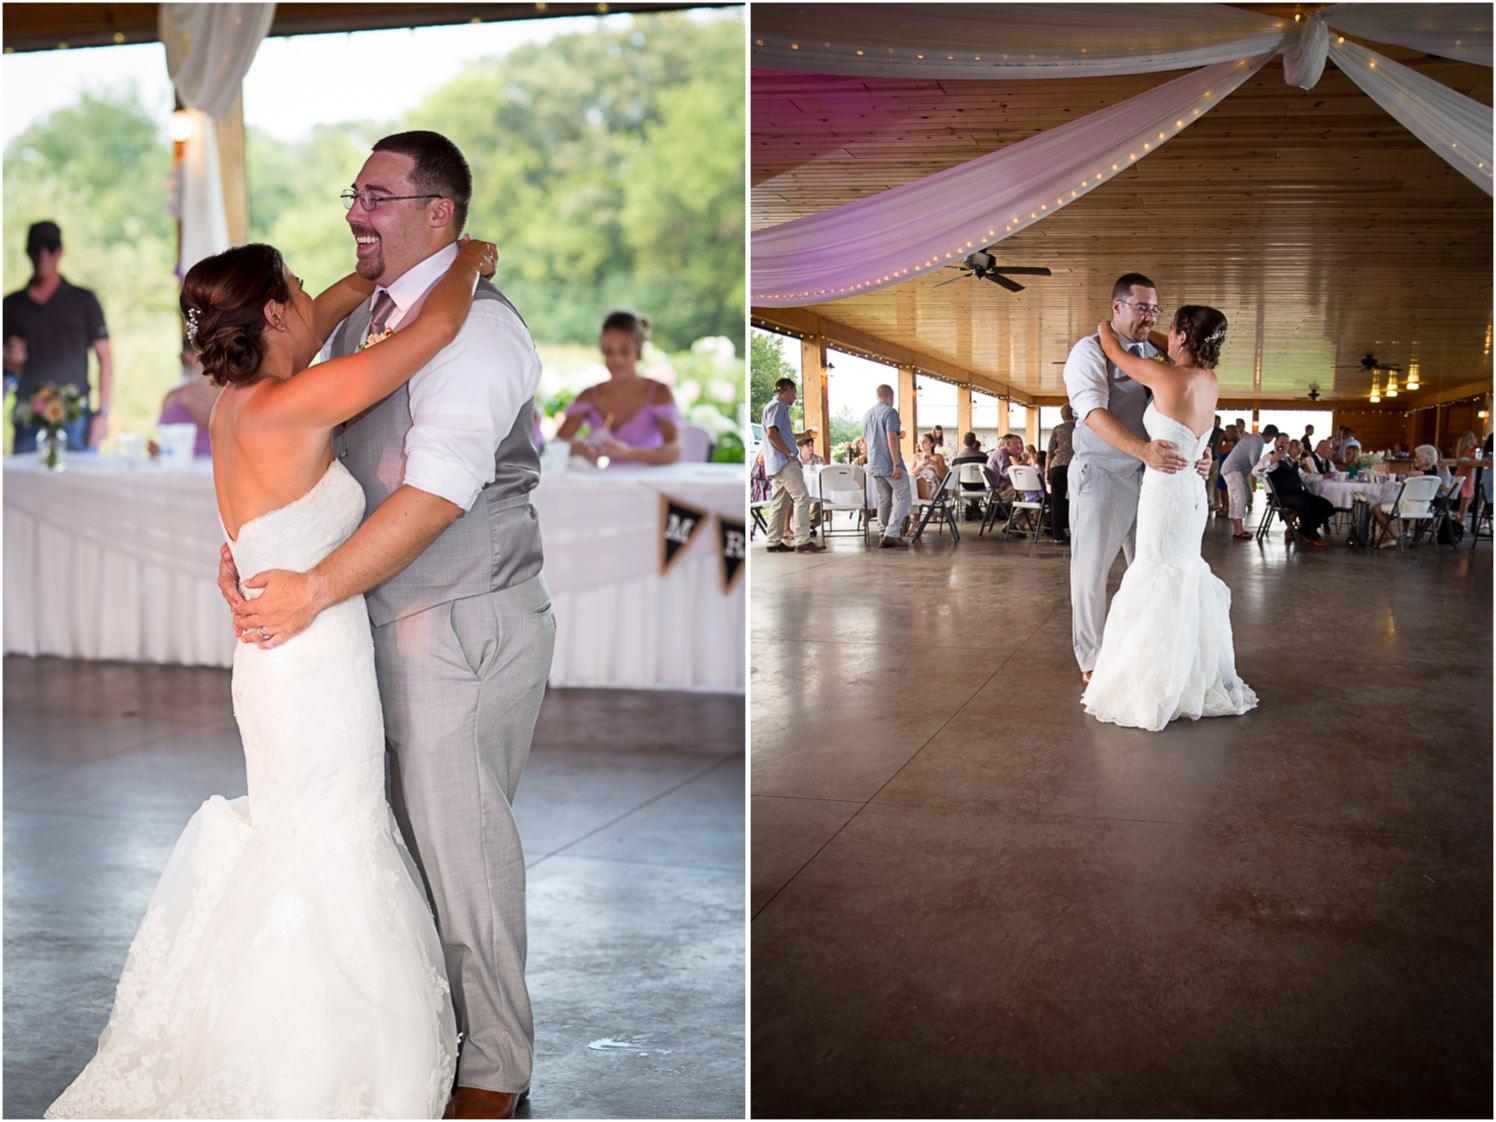 29-ridgetop-prescott-wisconsin-wedding-photographer-rustic-farm-corn-field-pavillion-reception-bride-and-groom-first-dance-mahonen-photography.jpg